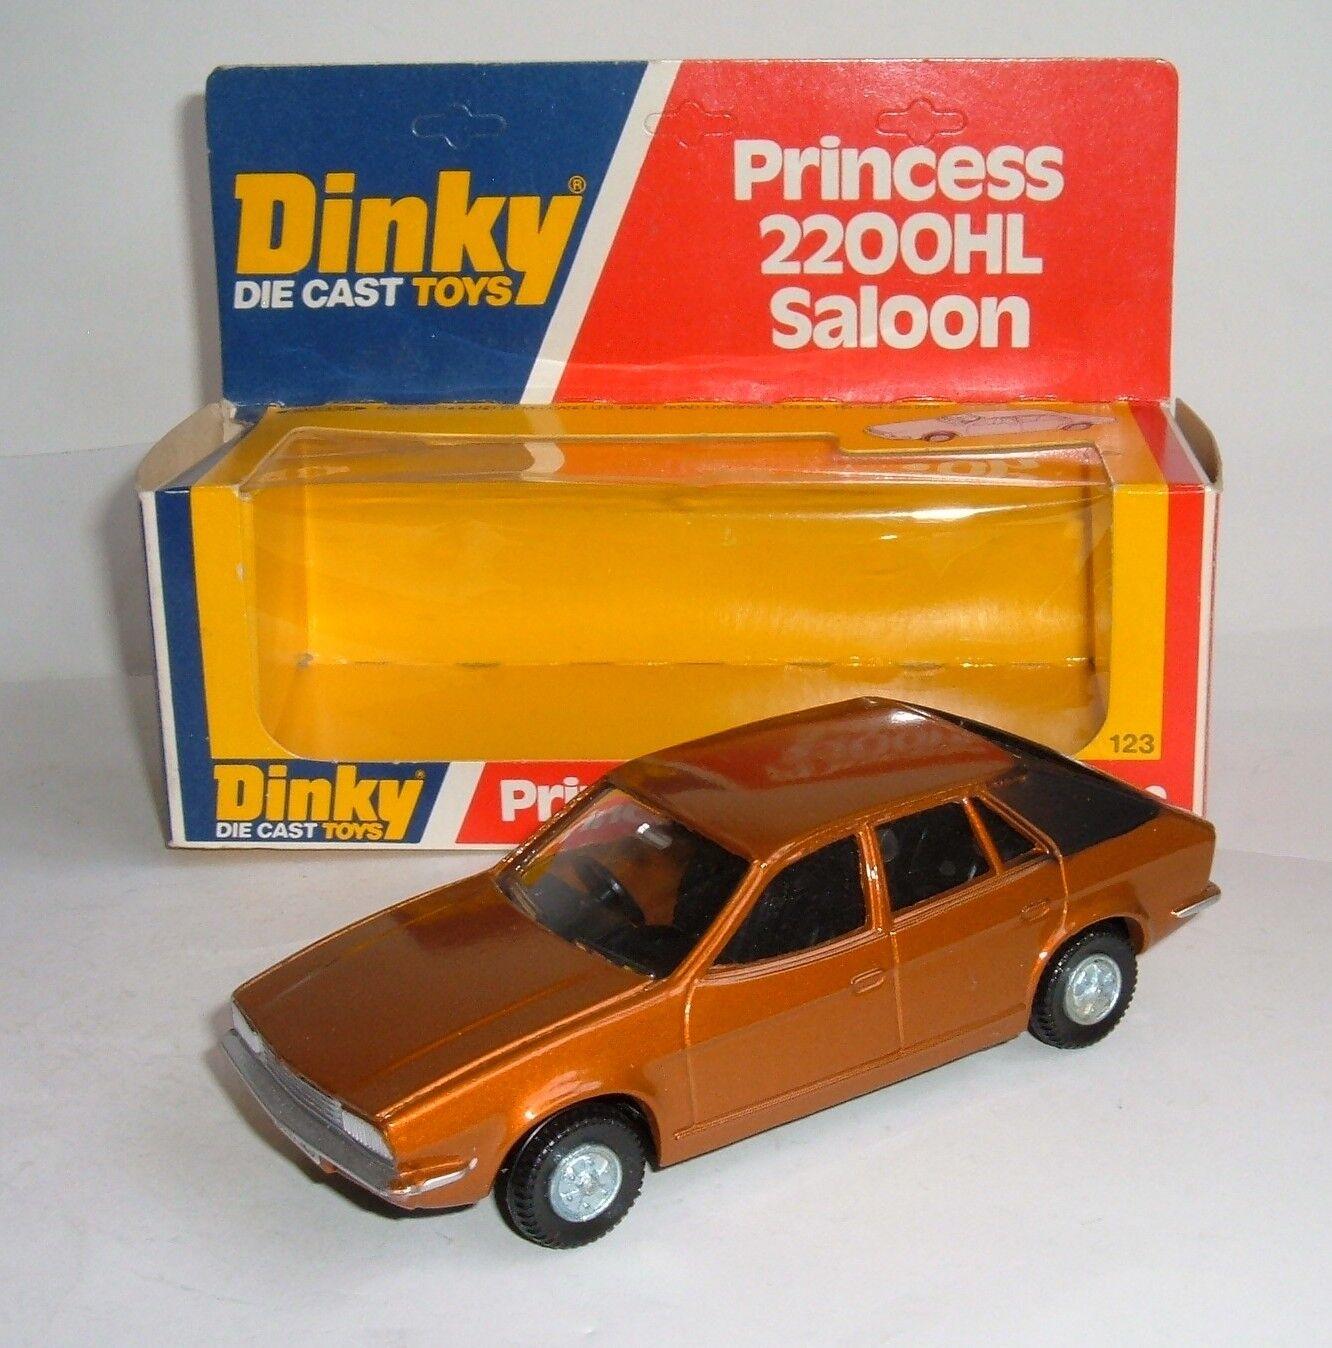 Dinky Toys No. 123, Princess 2200HL Saloon, - Superb